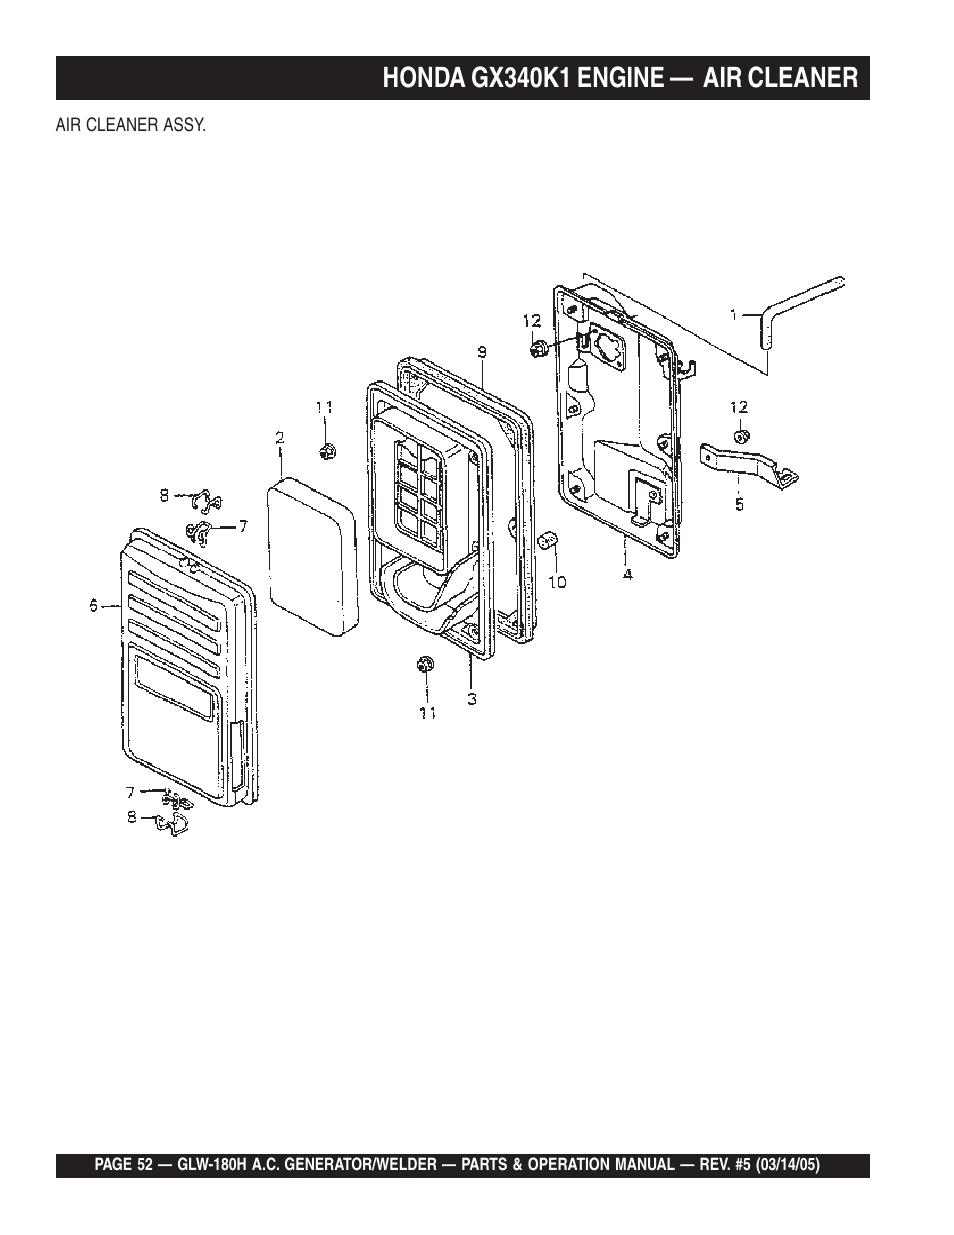 Gx340 K1 Manual Wiring Diagram Honda Gx340k1 Engine Air Cleaner Multiquip A C Generator Glw Rh Manualsdir Com